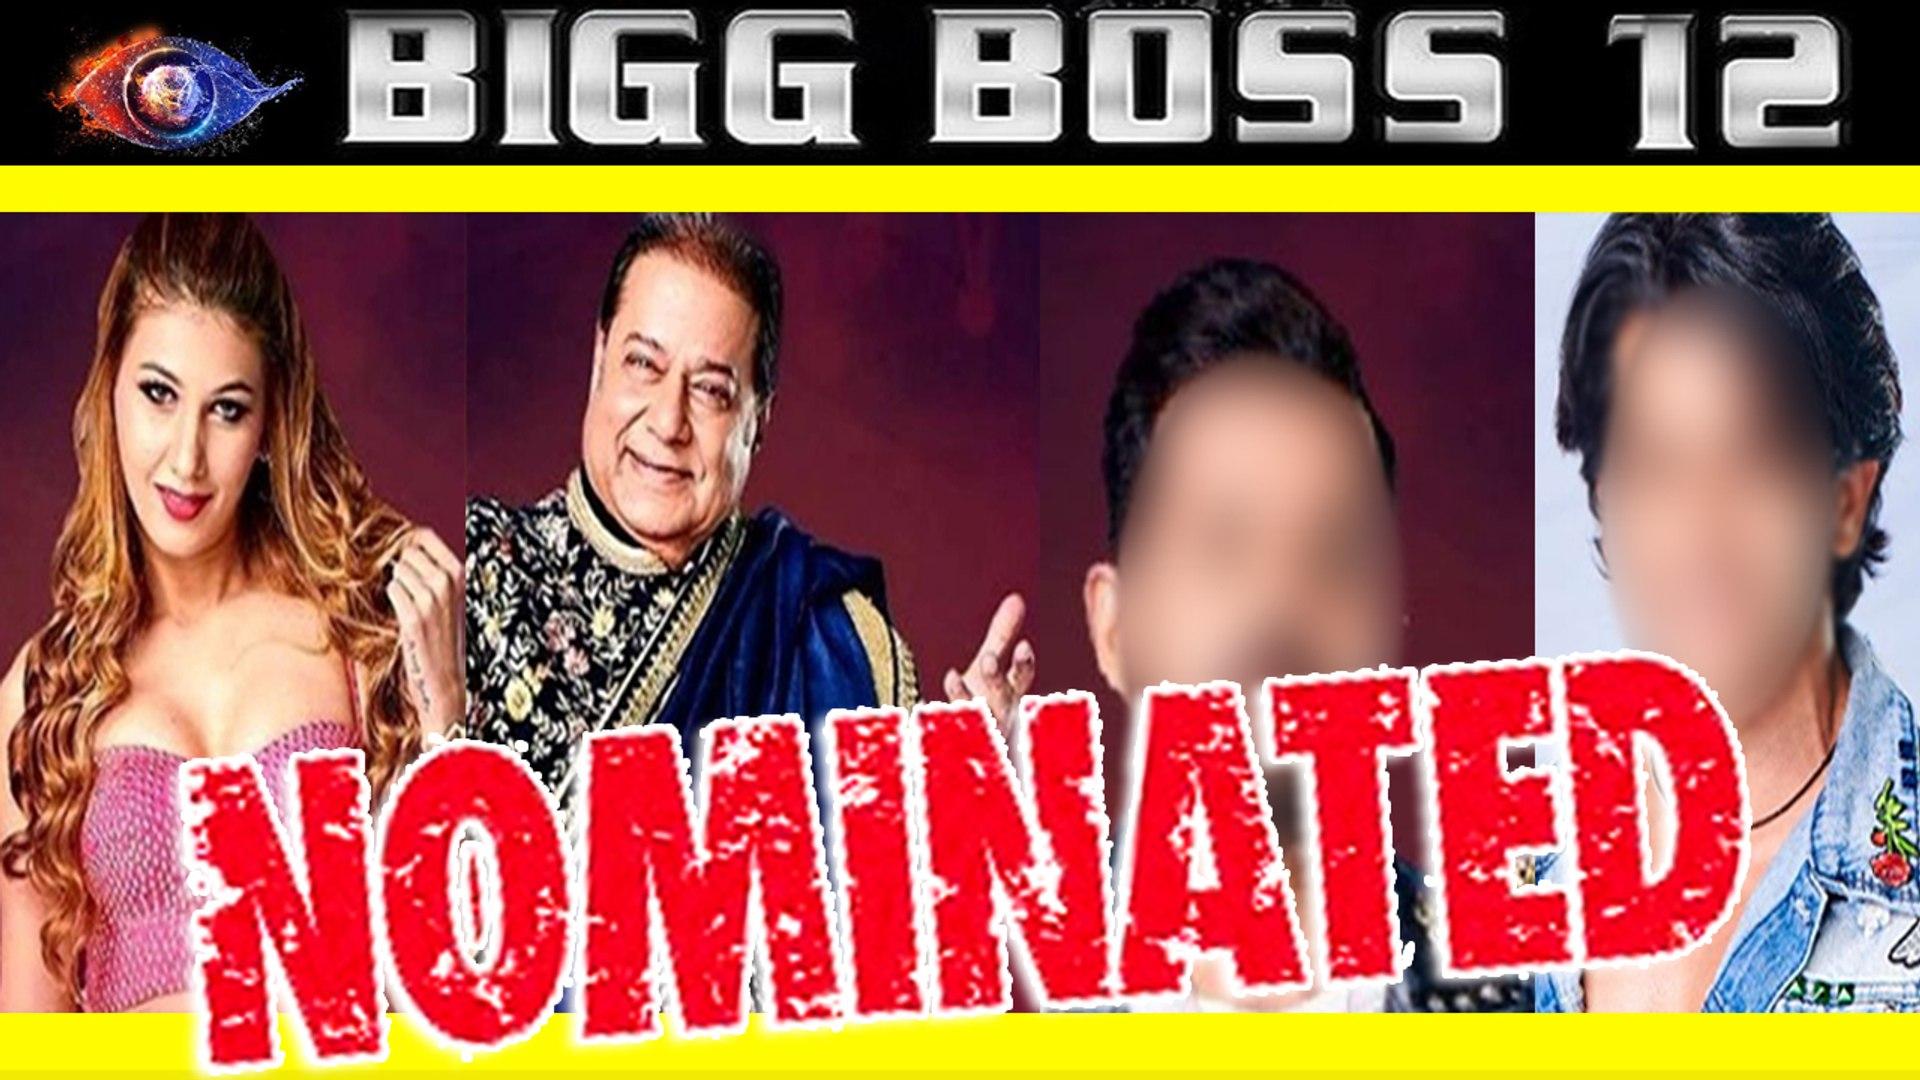 Bigg Boss 12: Anup Jalota, Jasleen Matharu & these 2 singles get NOMINATED | FilmiBeat